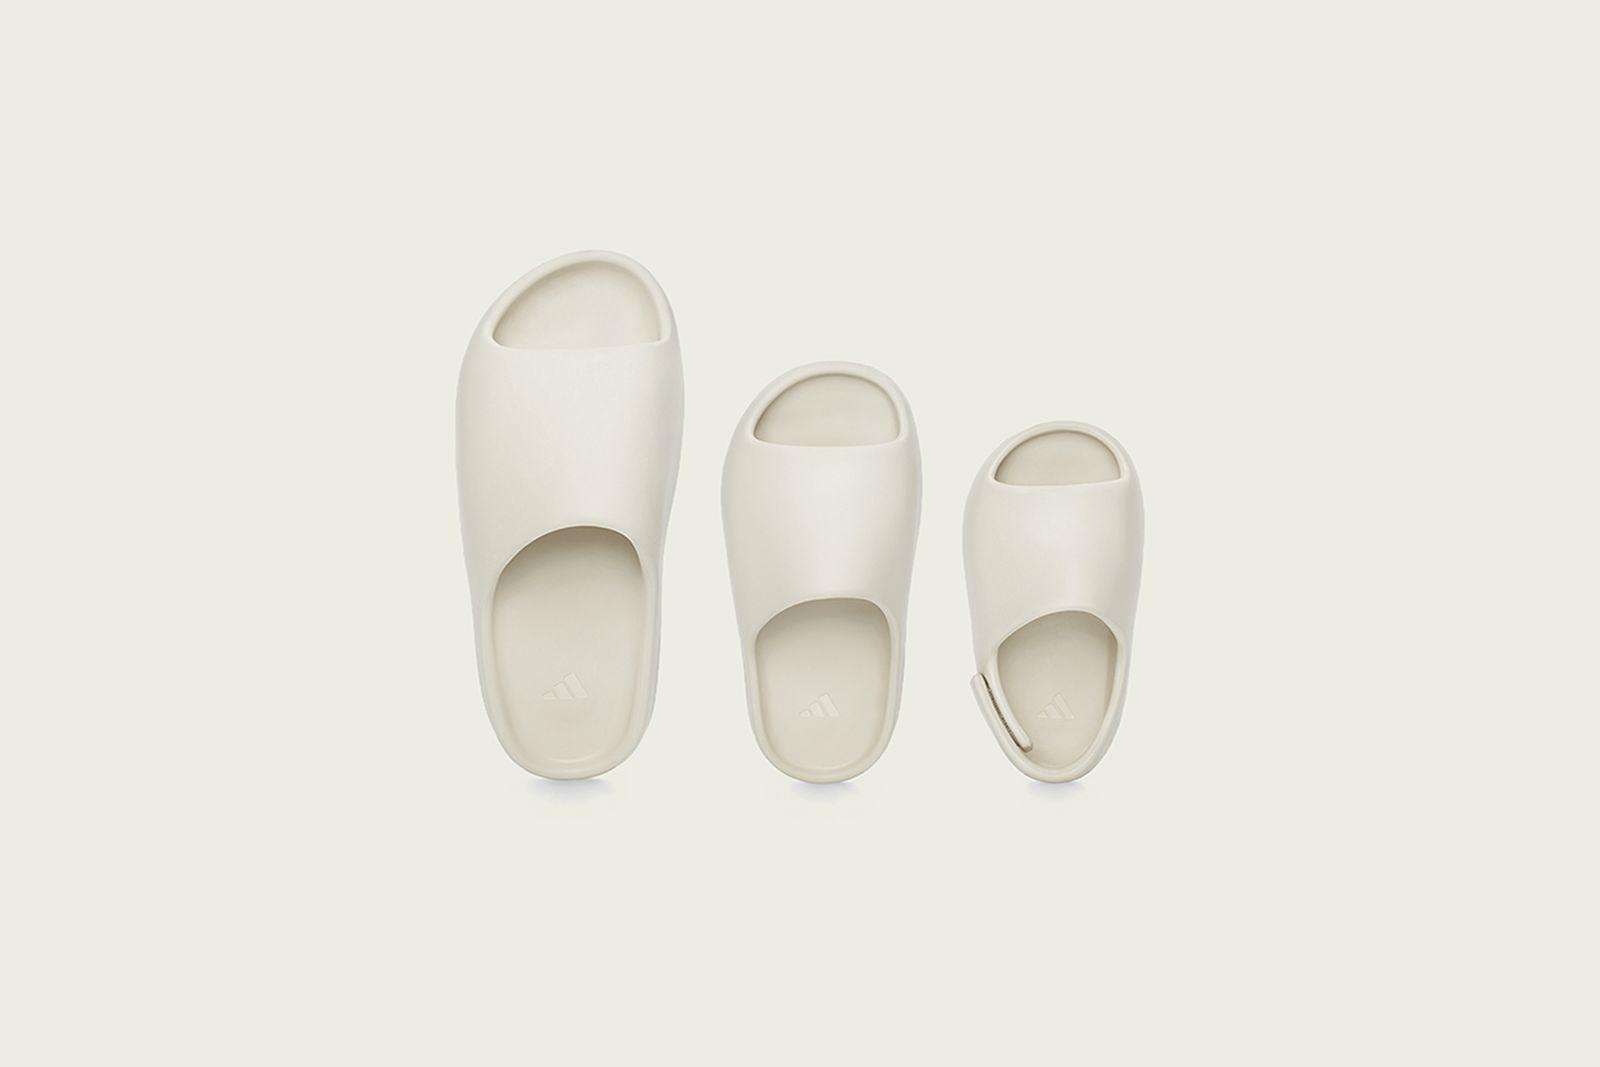 adidas-yeezy-slide-release-date-price-06